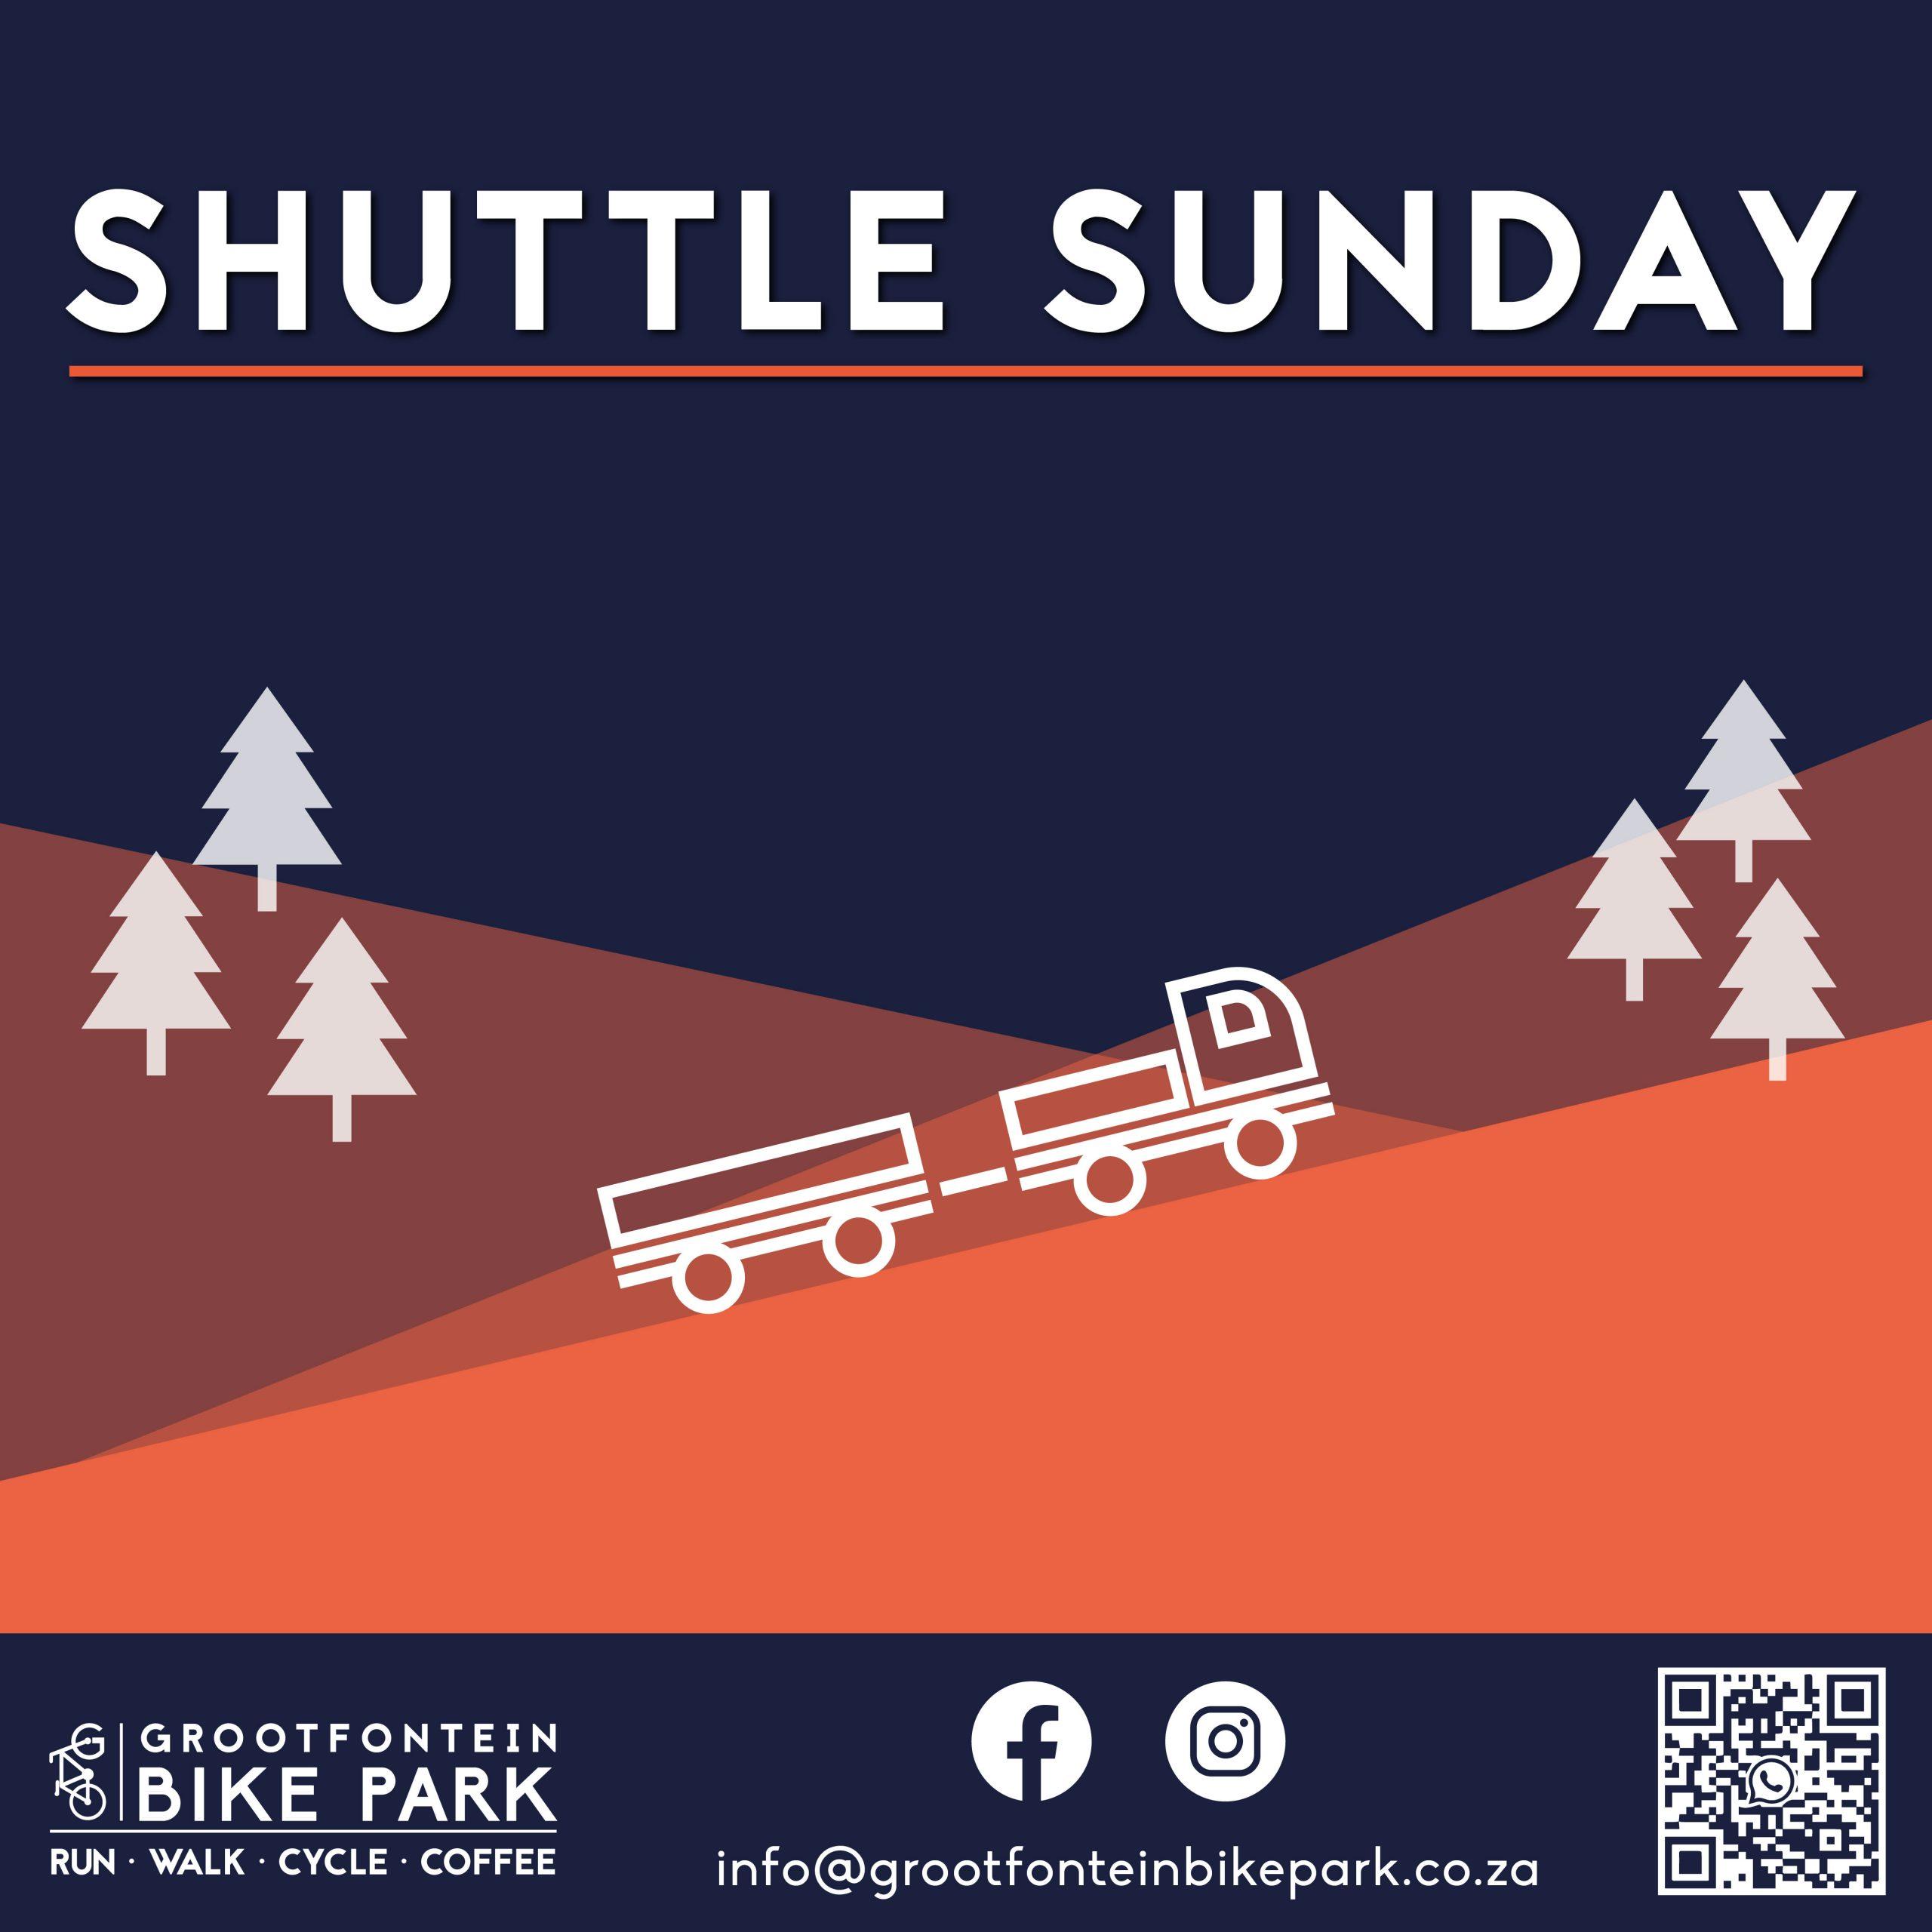 Shuttle Sunday